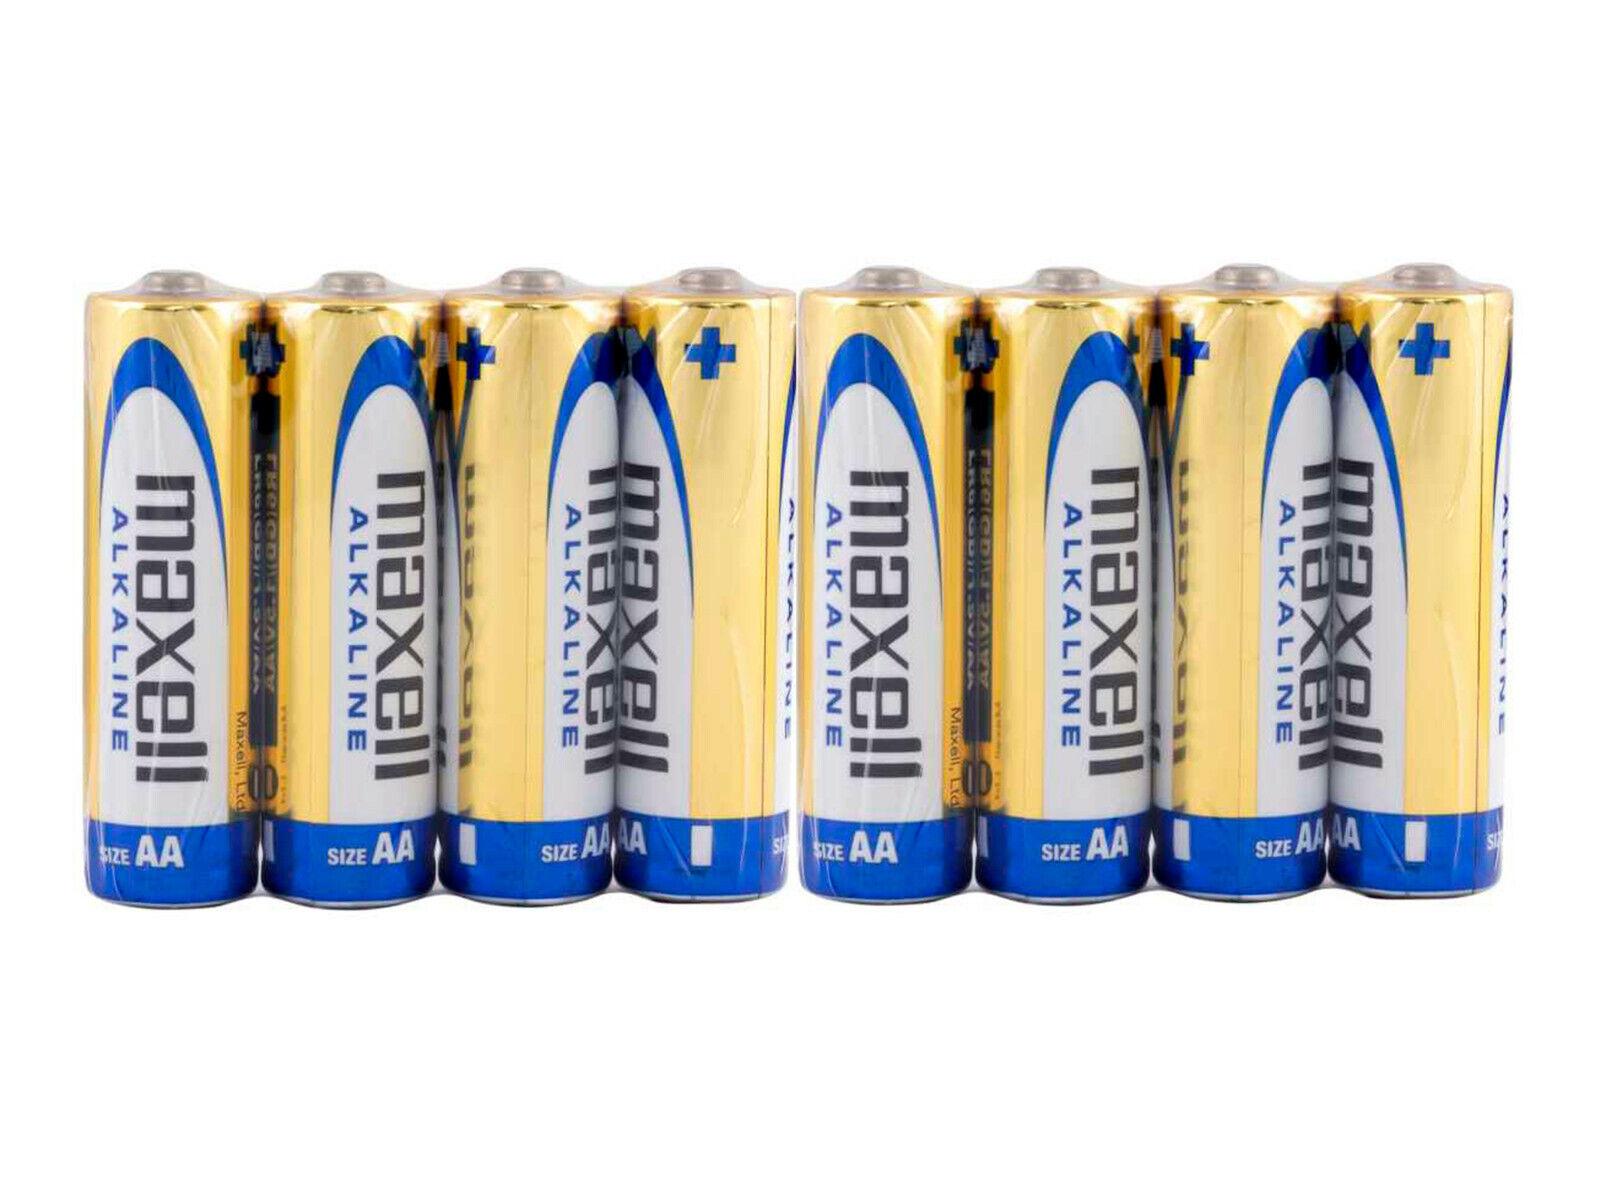 8 X Maxell Batteries Stylus AA Alkaline Batteries lr6 shrink battery